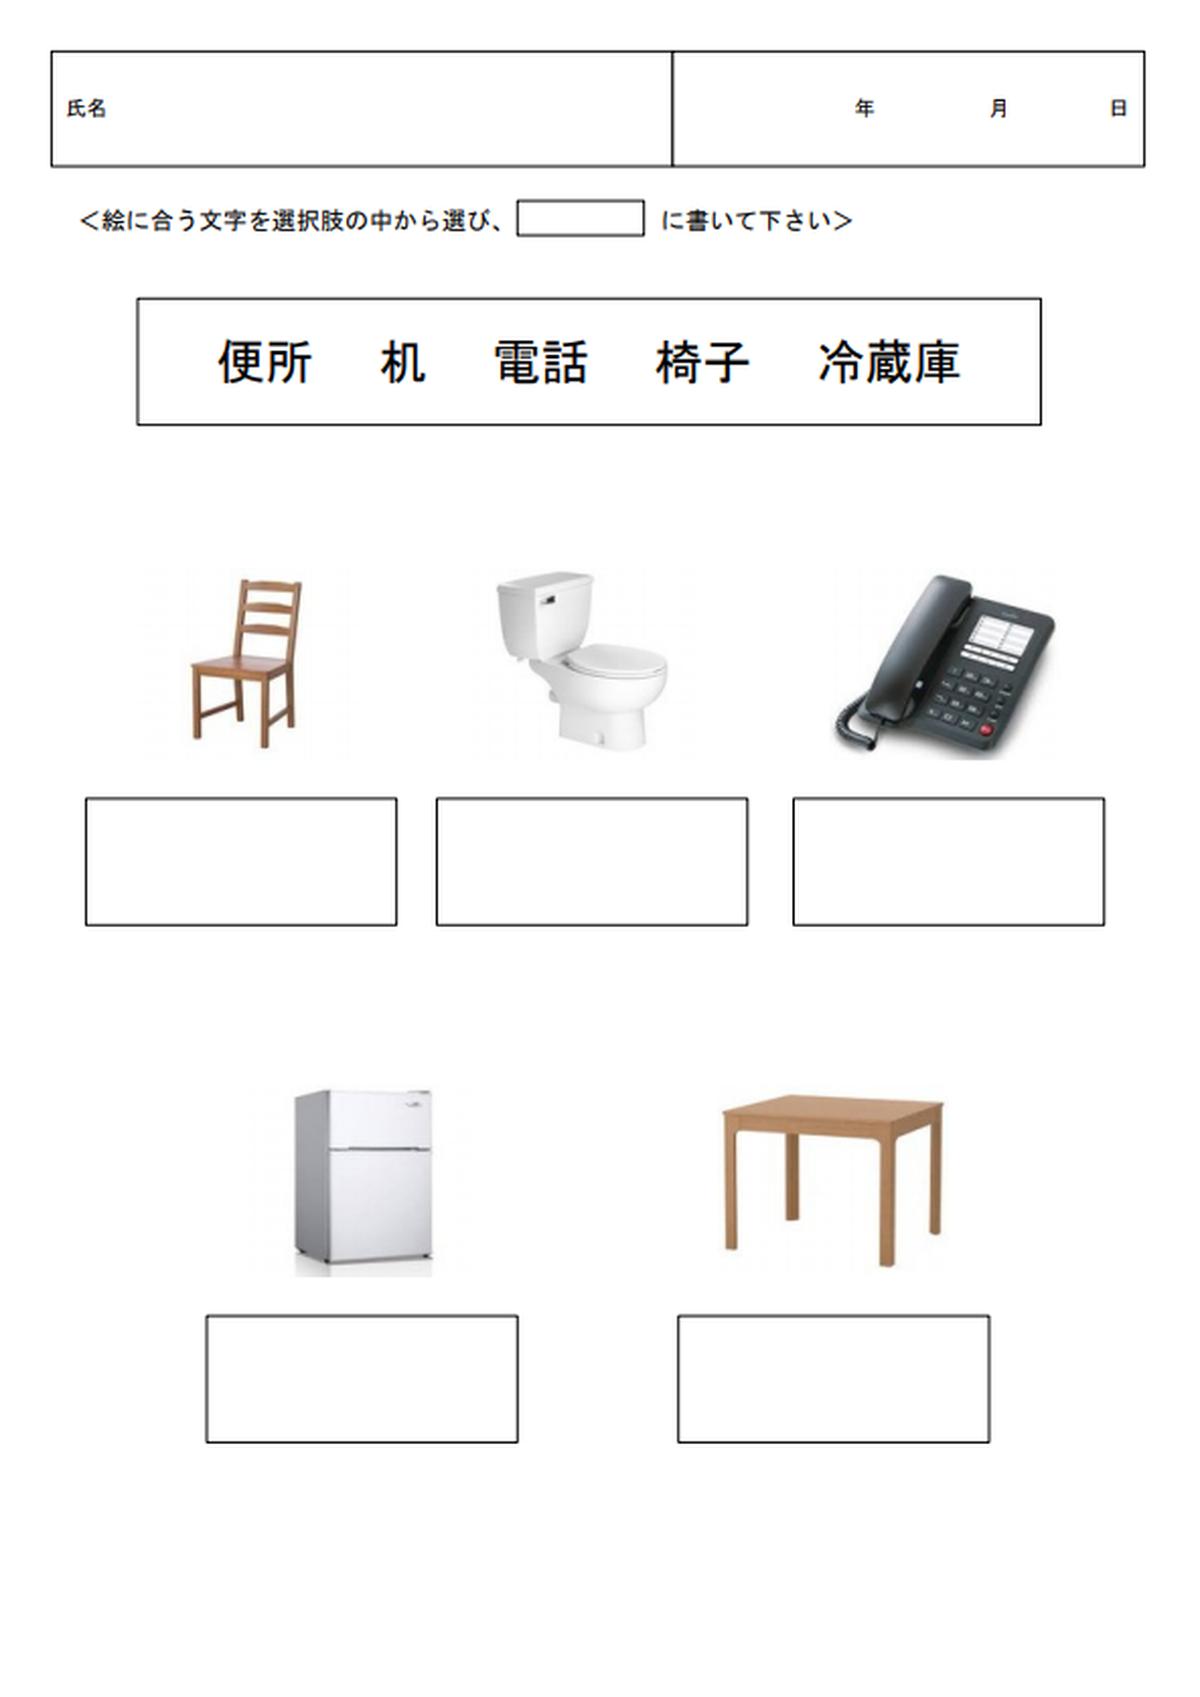 pdf コピペ 文字 半分